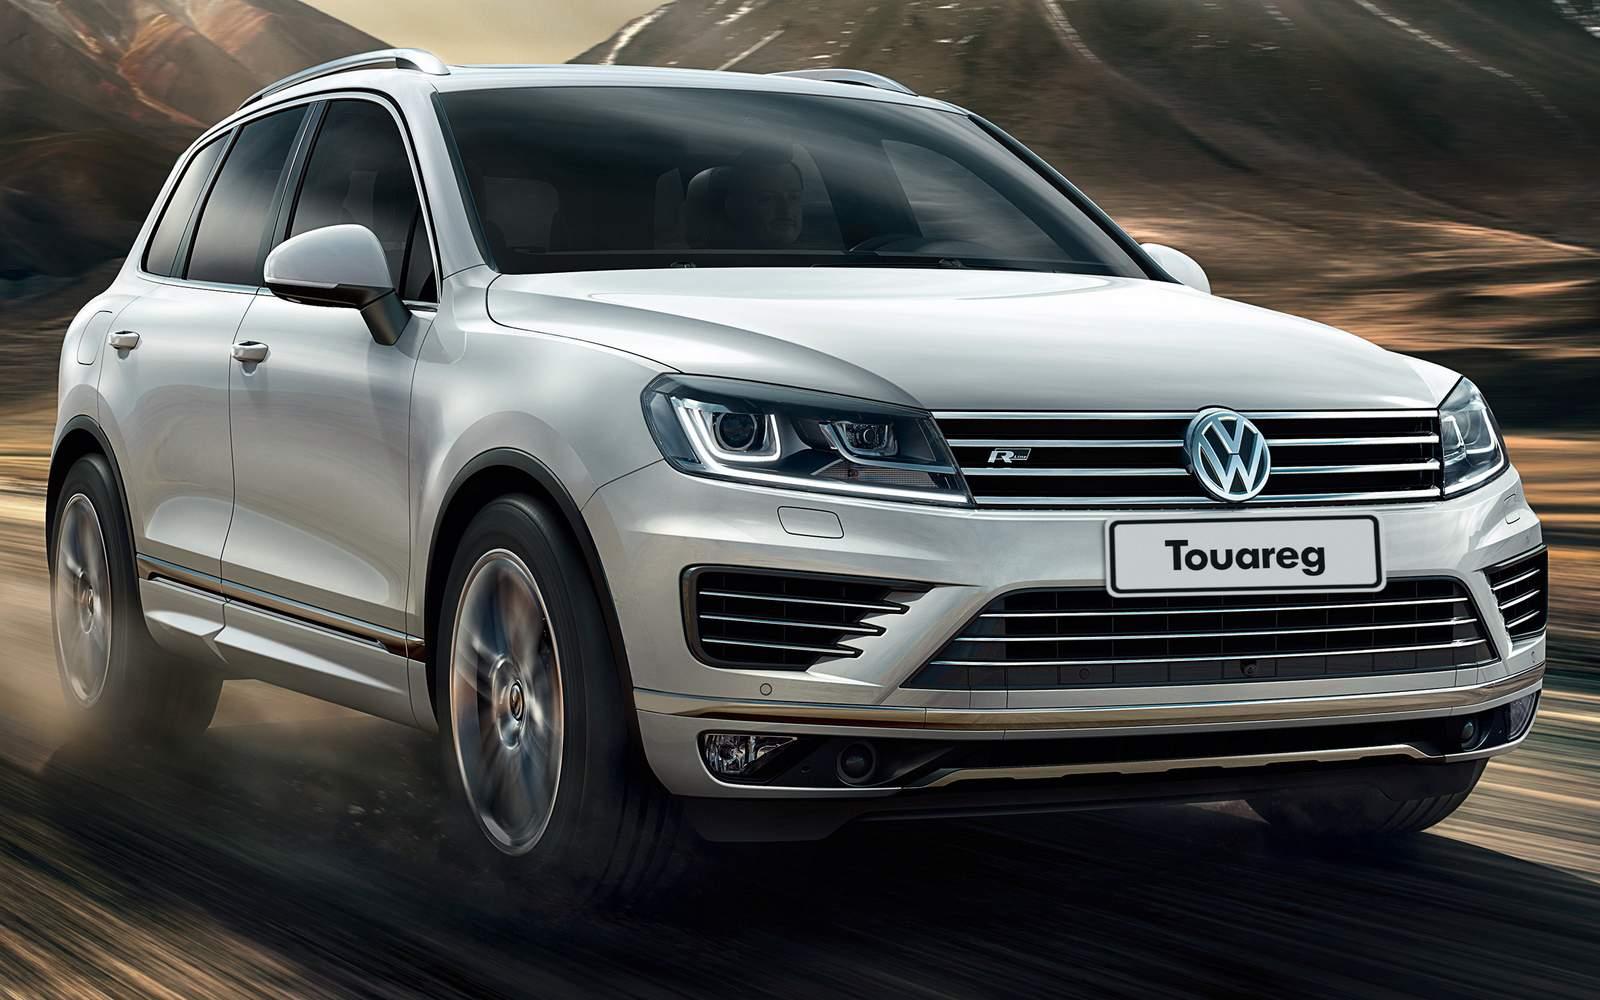 Novo VW Touareg 2015 V8 - interior